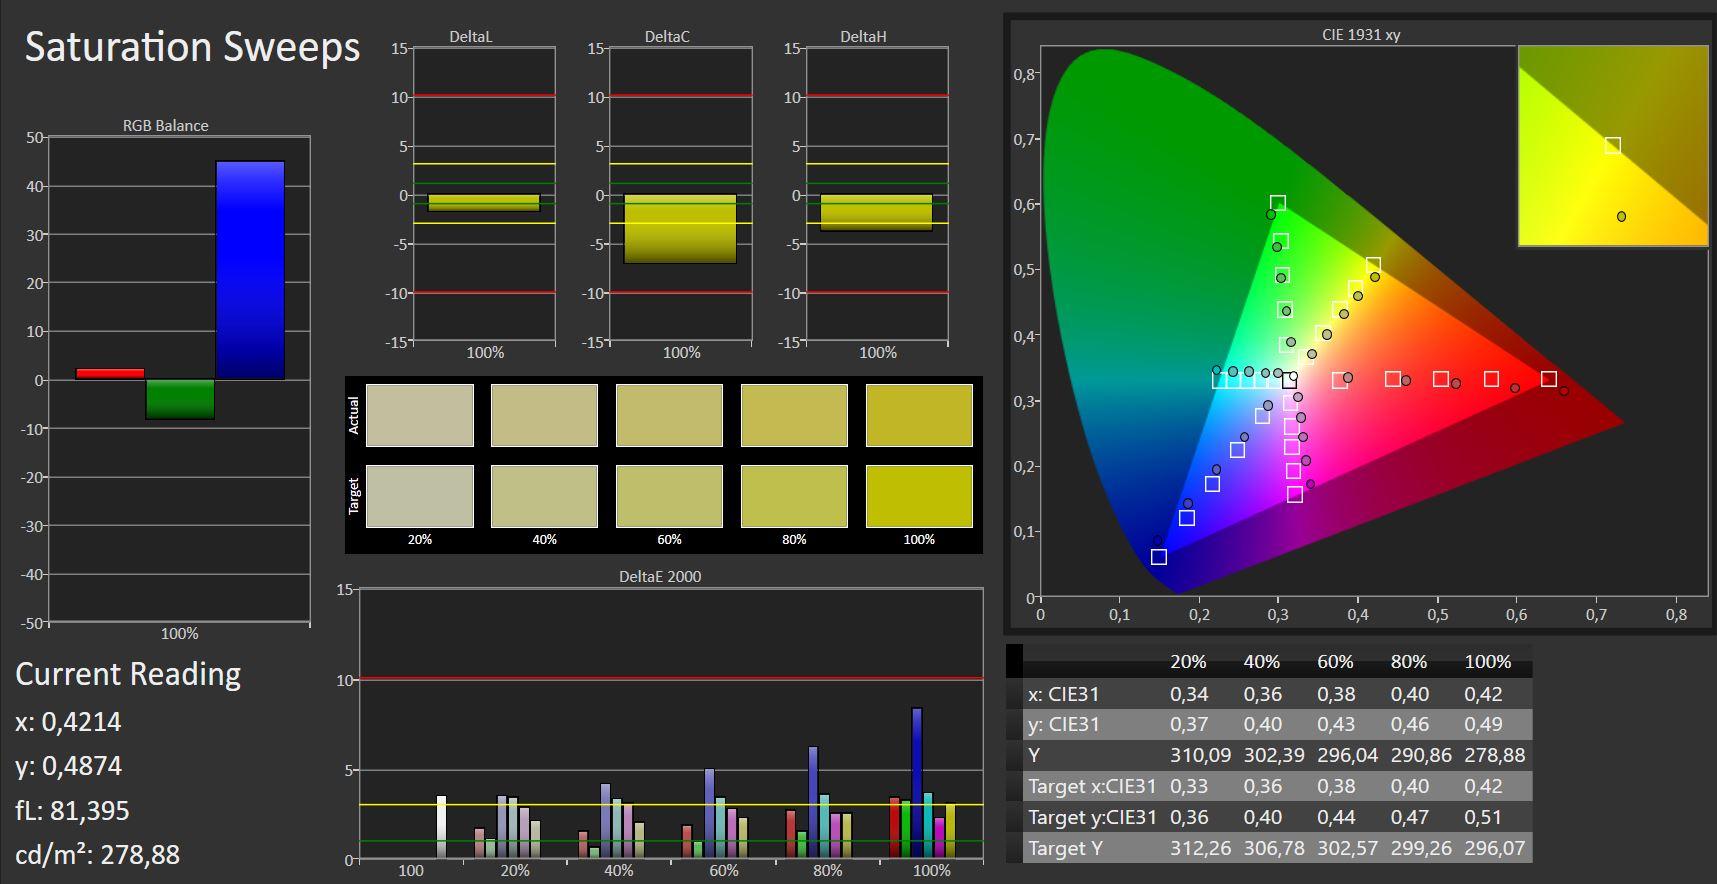 Test Hp Elitebook 840 G5 I7 8550u Ssd Fhd Laptop Notebookcheck Cat 303 5c Wiring Diagram Calman Farbsttigung Kalibriert